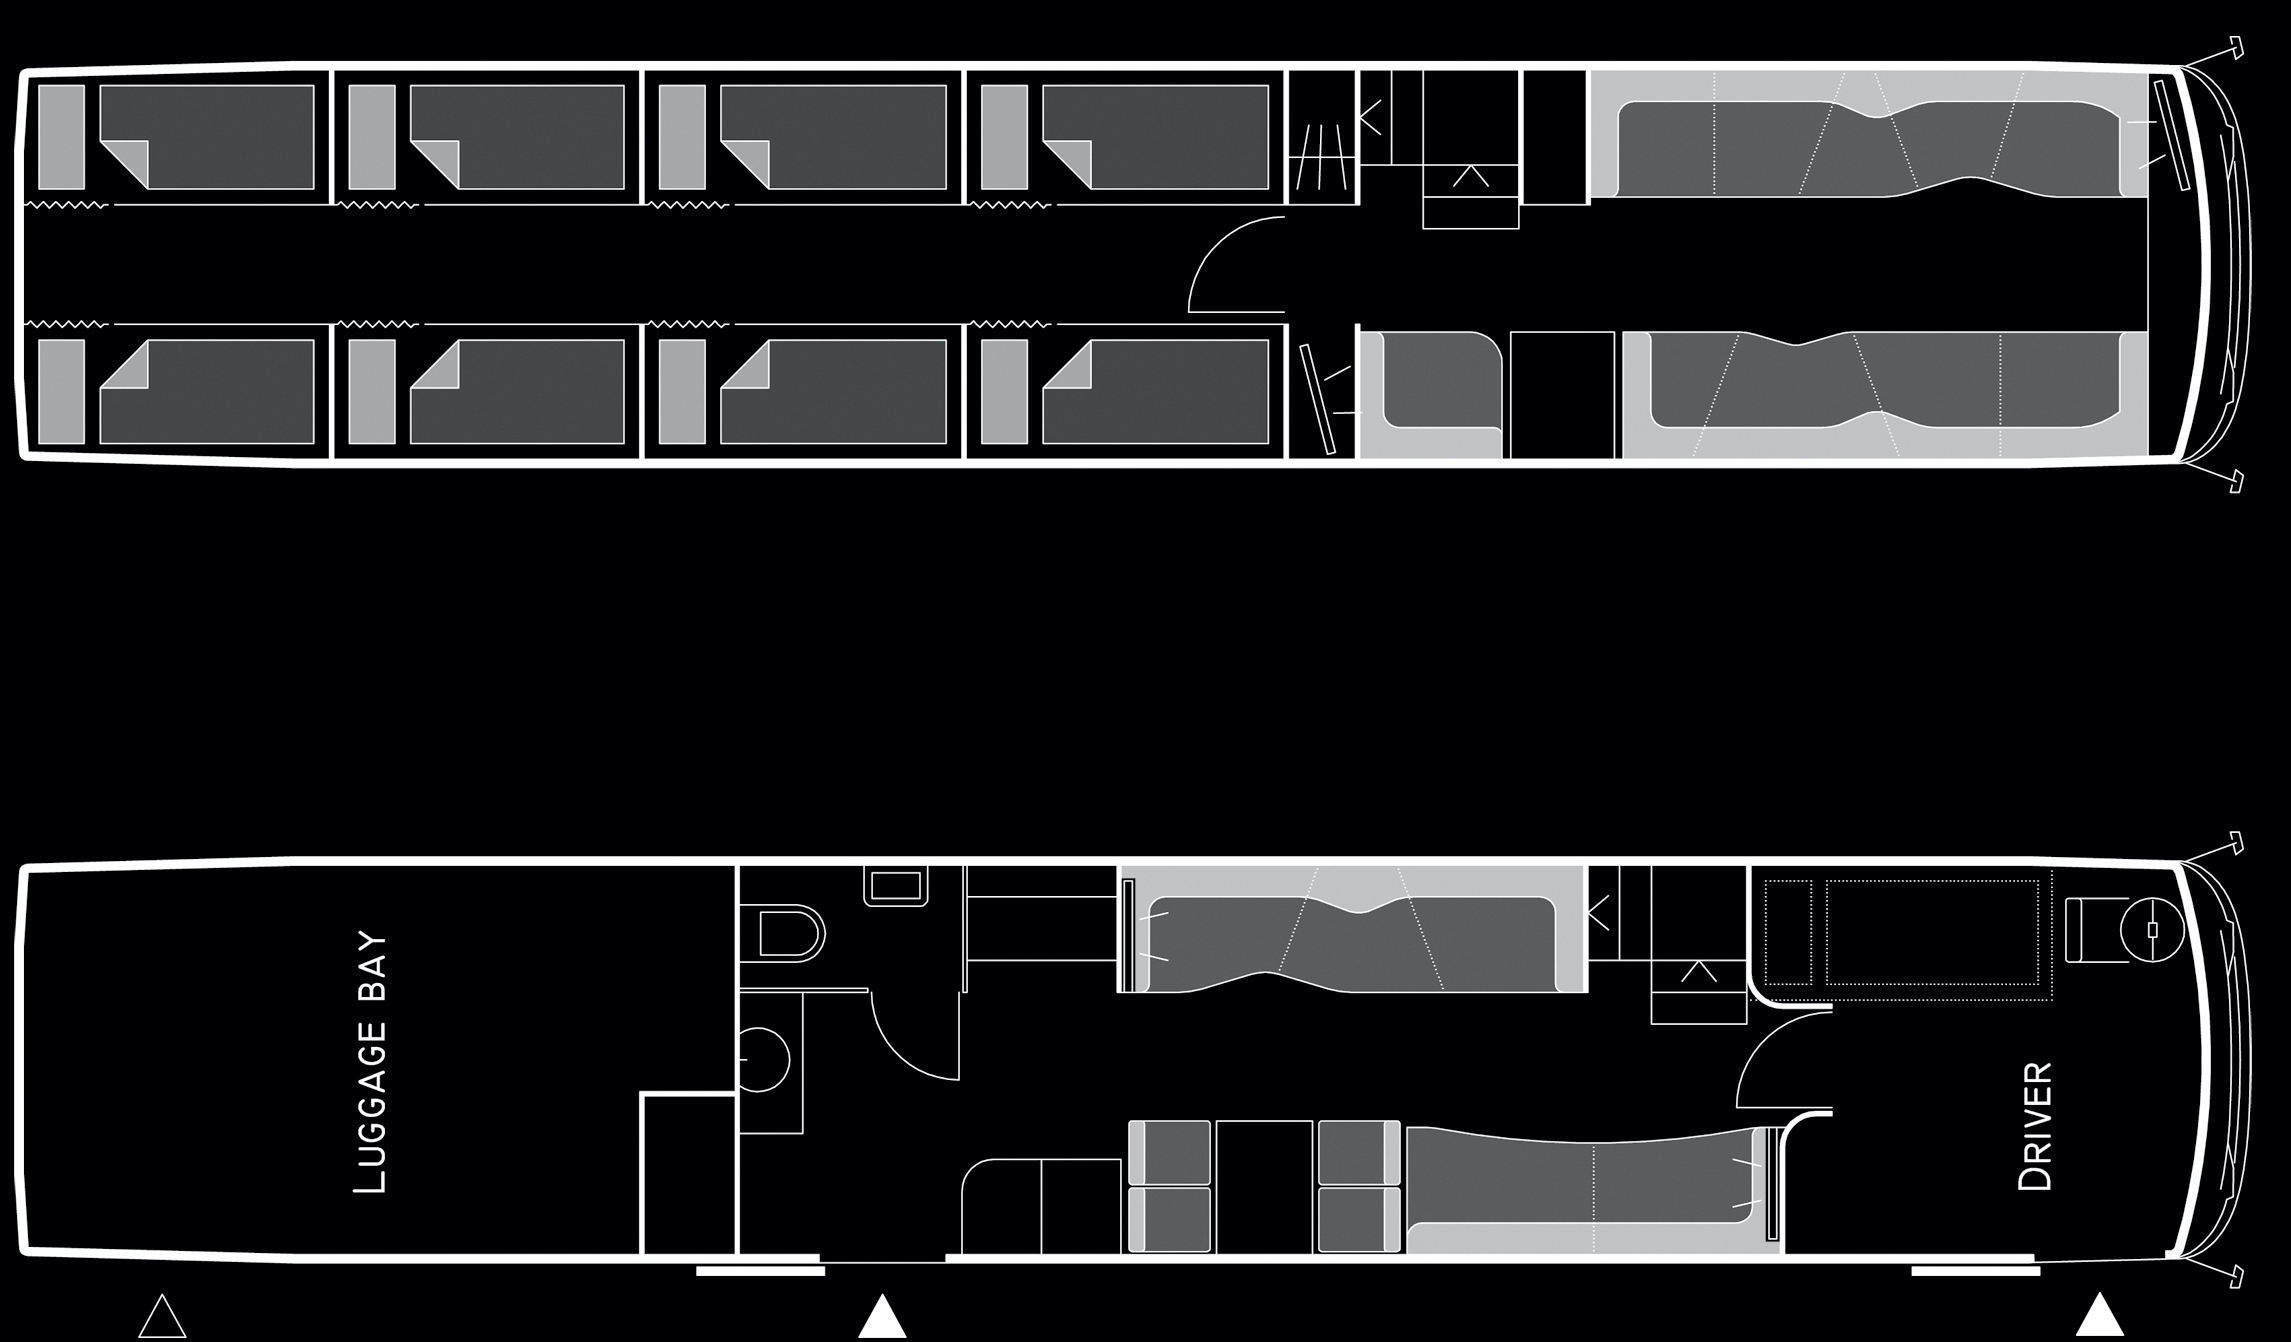 Beat the Street - Setra Doubledeckers 16 Bunks Floor Plan